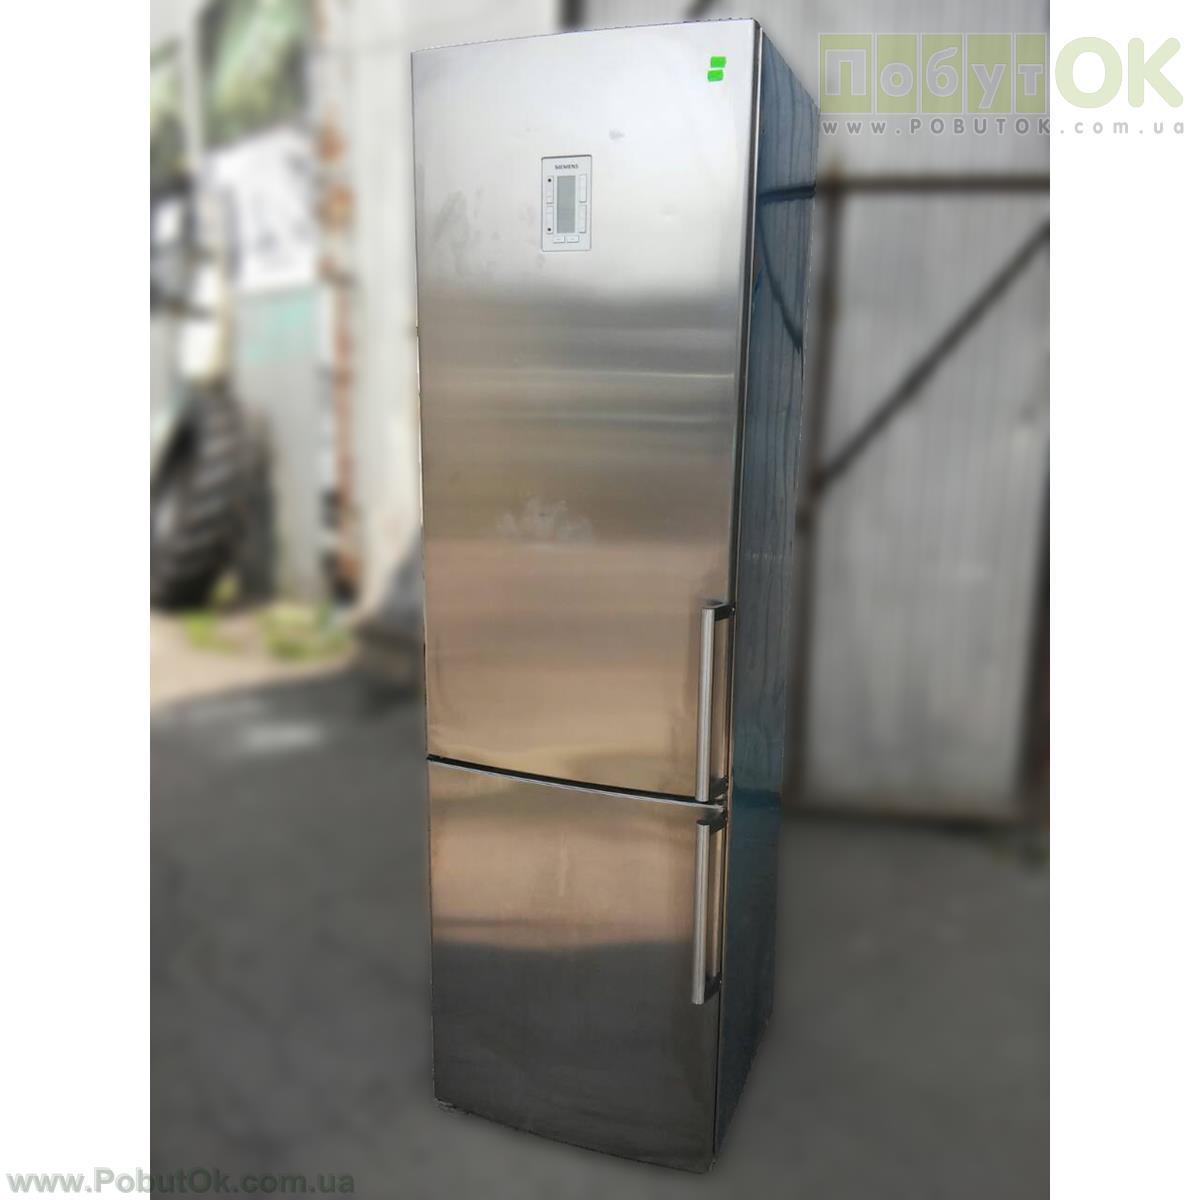 Холодильник SIEMENS KG39FP90/03 (Код:1506) Состояние: Б/У, фото 1